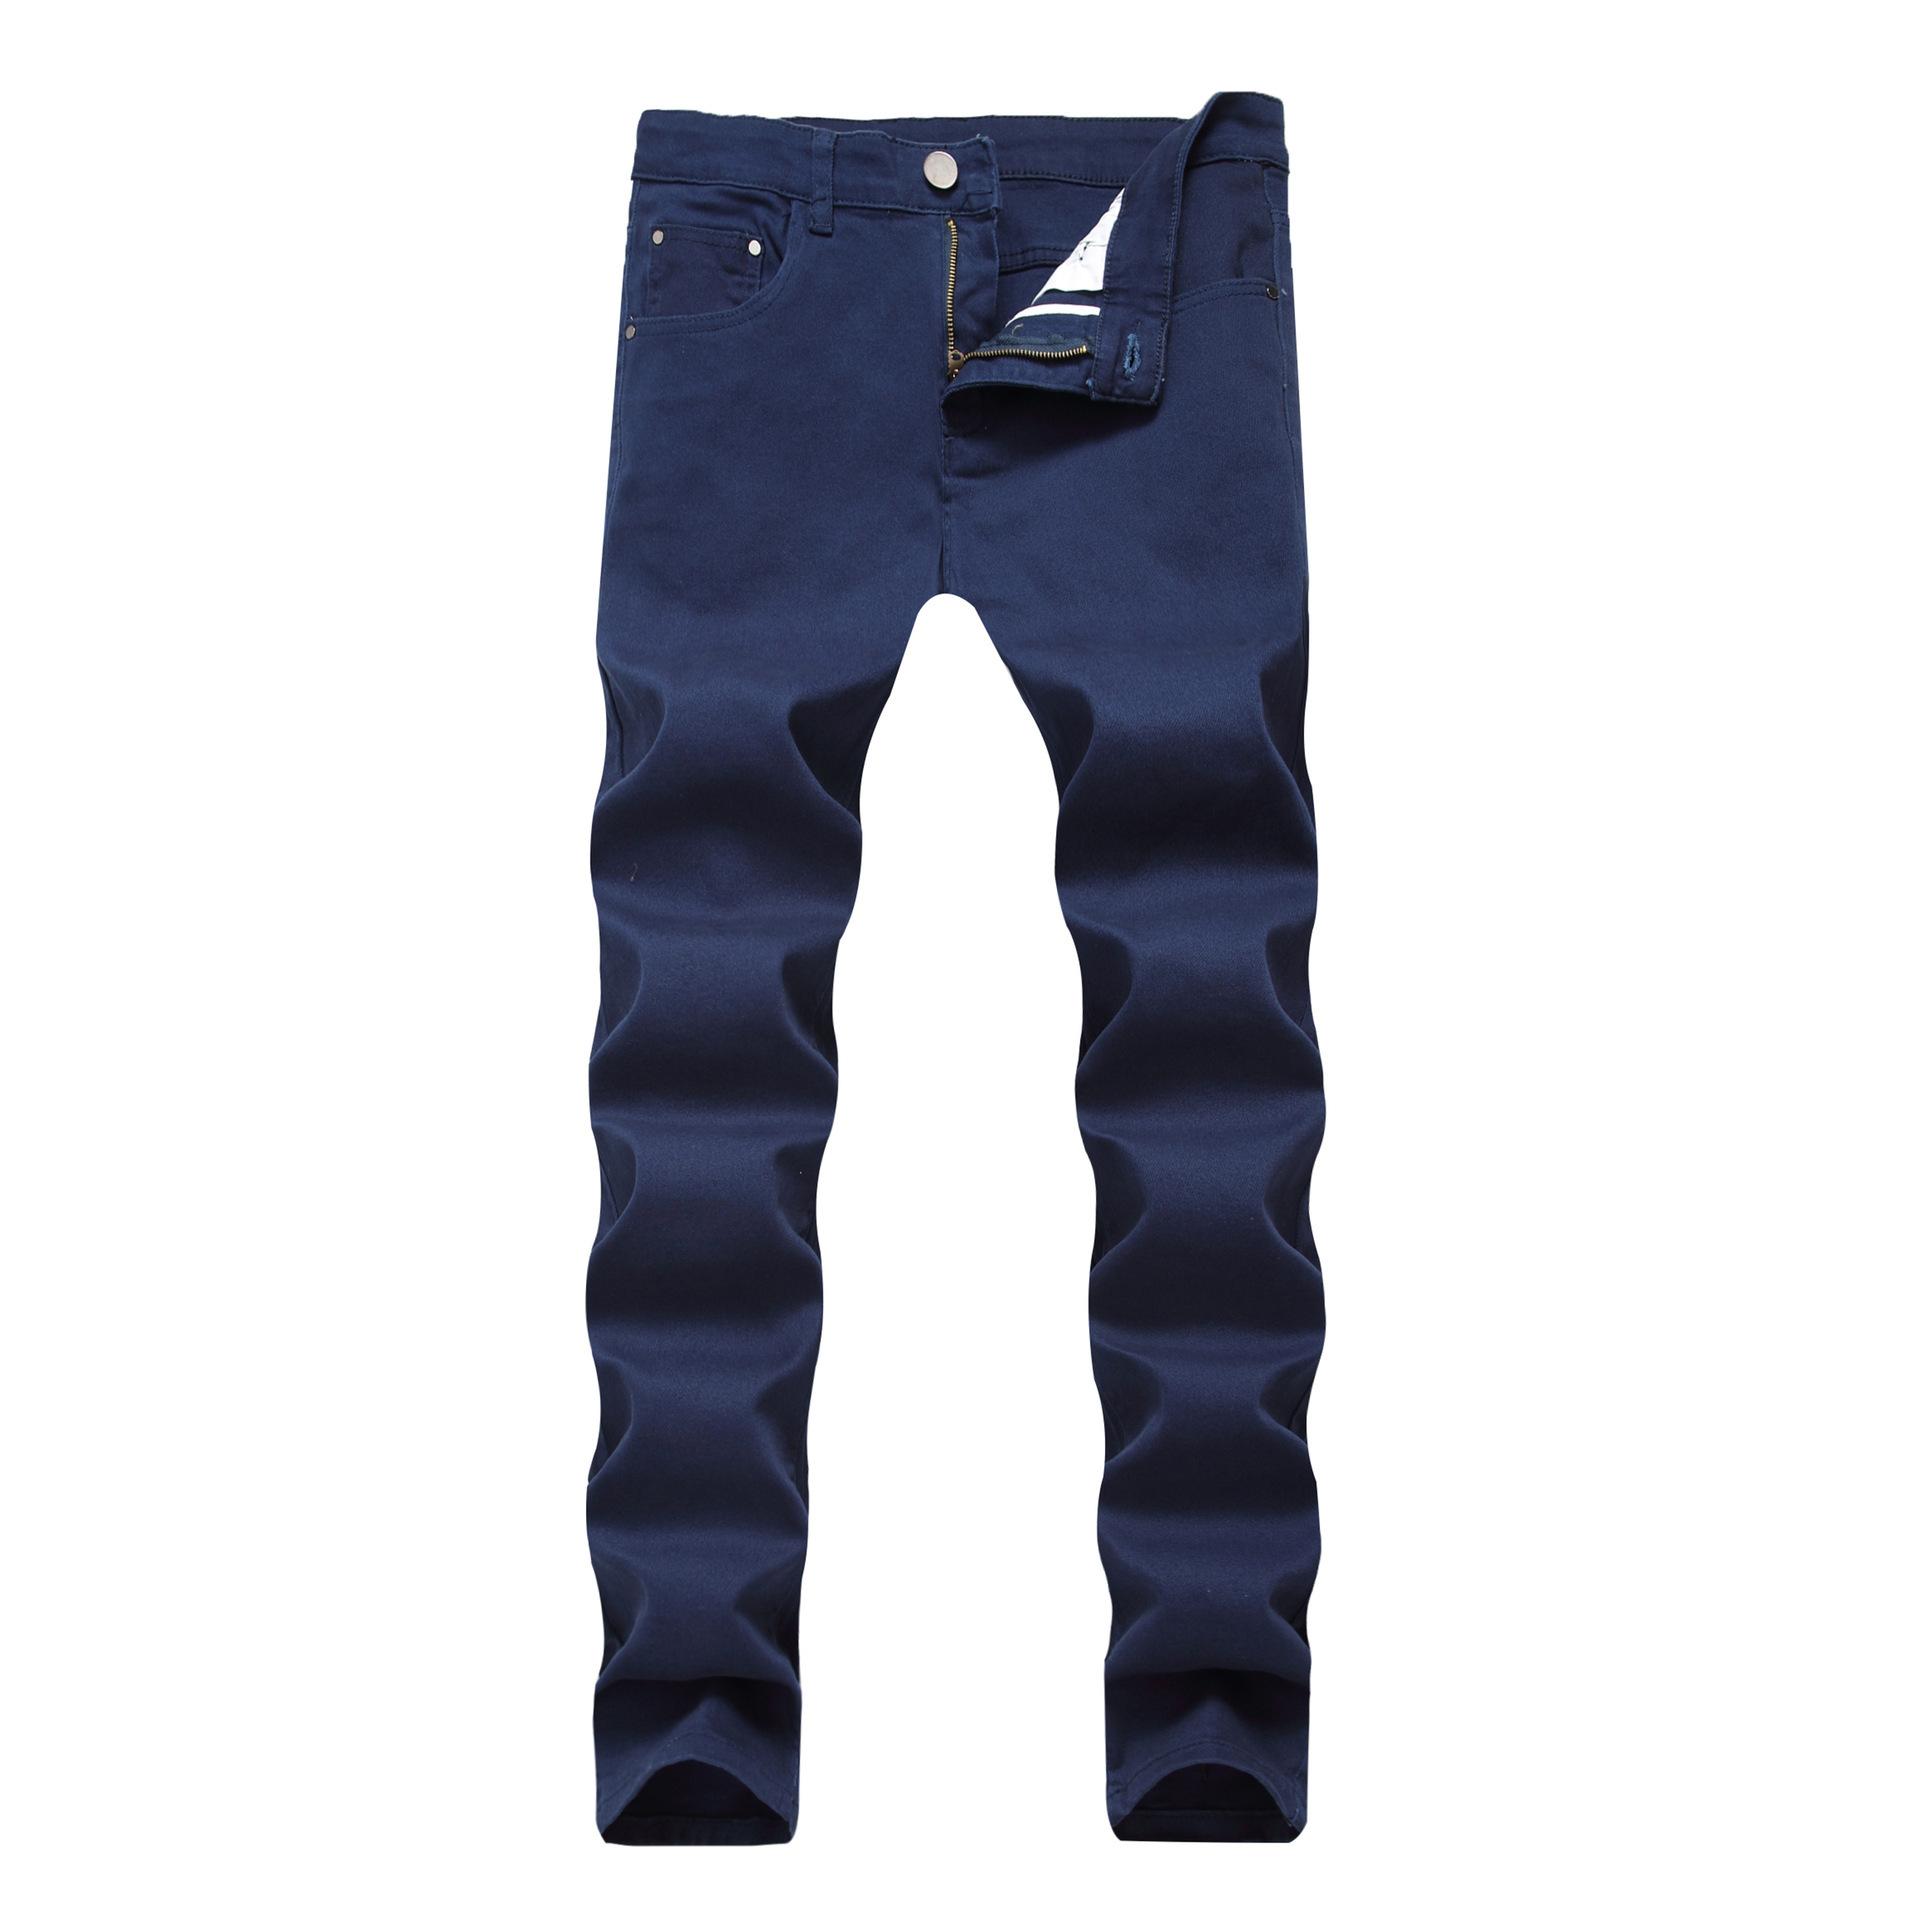 Mens Skinny Jeans 2020 New Classic Male Fashion Designer Elastic Straight Red Black Jeans Pants Slim Fit Stretch Denim Jeans